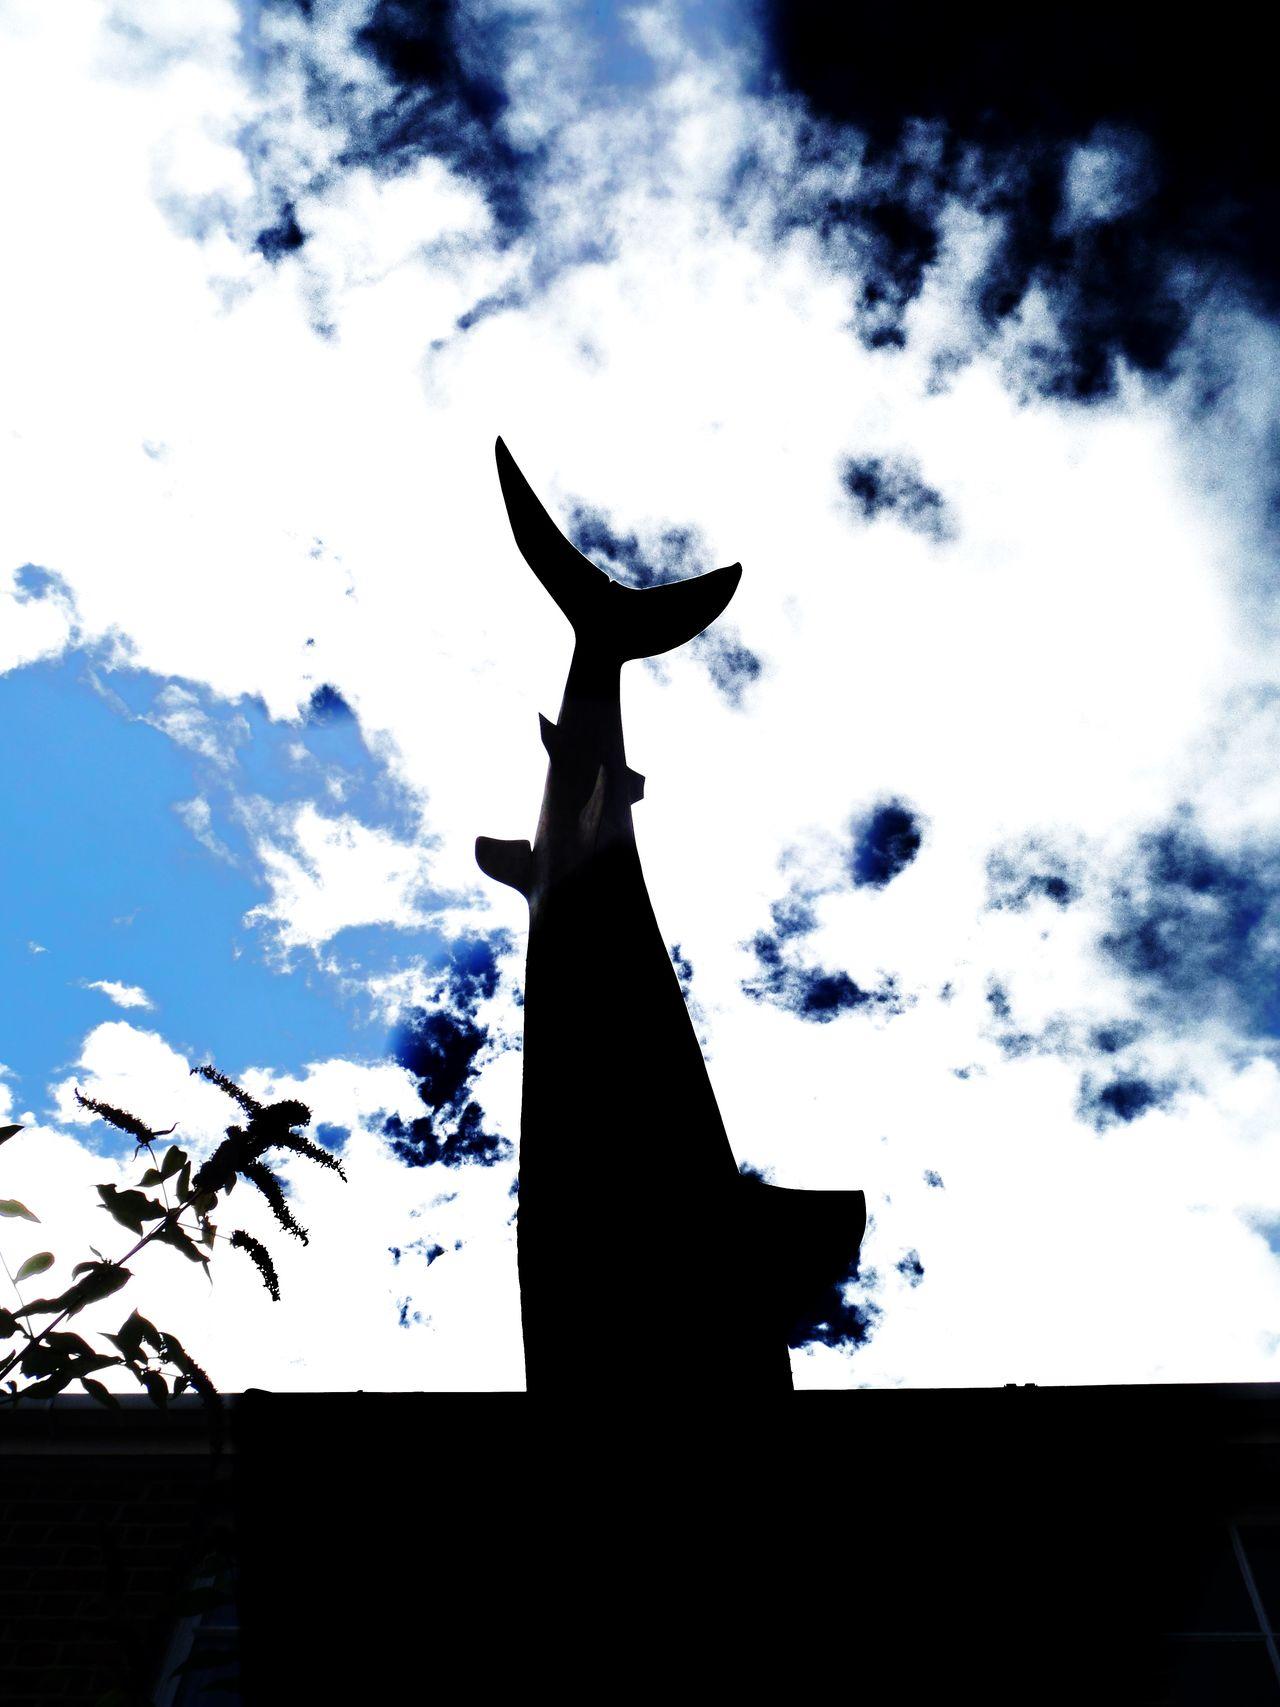 Architecture Black. Blue Cloud - Sky Day Ediyt Landmark. No People No People. Beauty In Nature Diamond Pattern Outdoors Sculpture Shark Sculpture In Rooftop. Silhouette.. Sky Statue Sunlight Tree